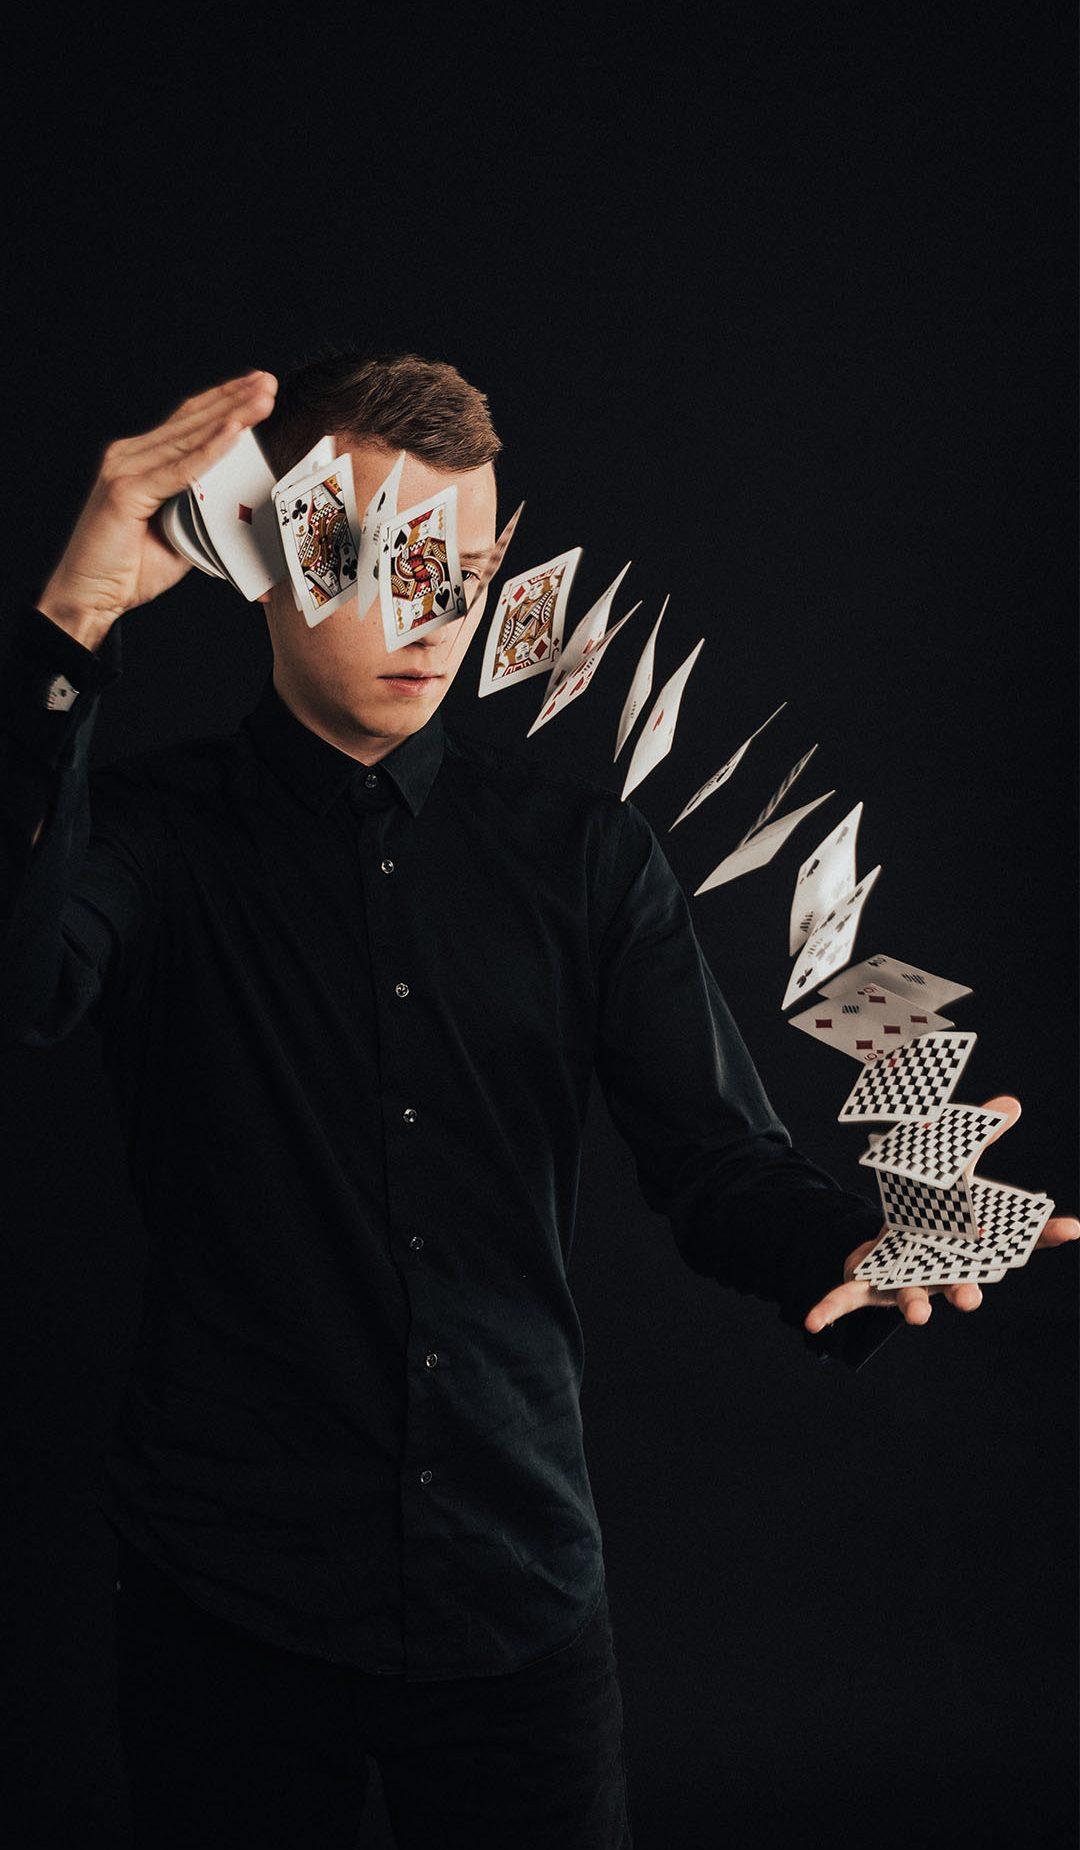 Richmaster-mustkunstnik-richard-kaarna-kontakt